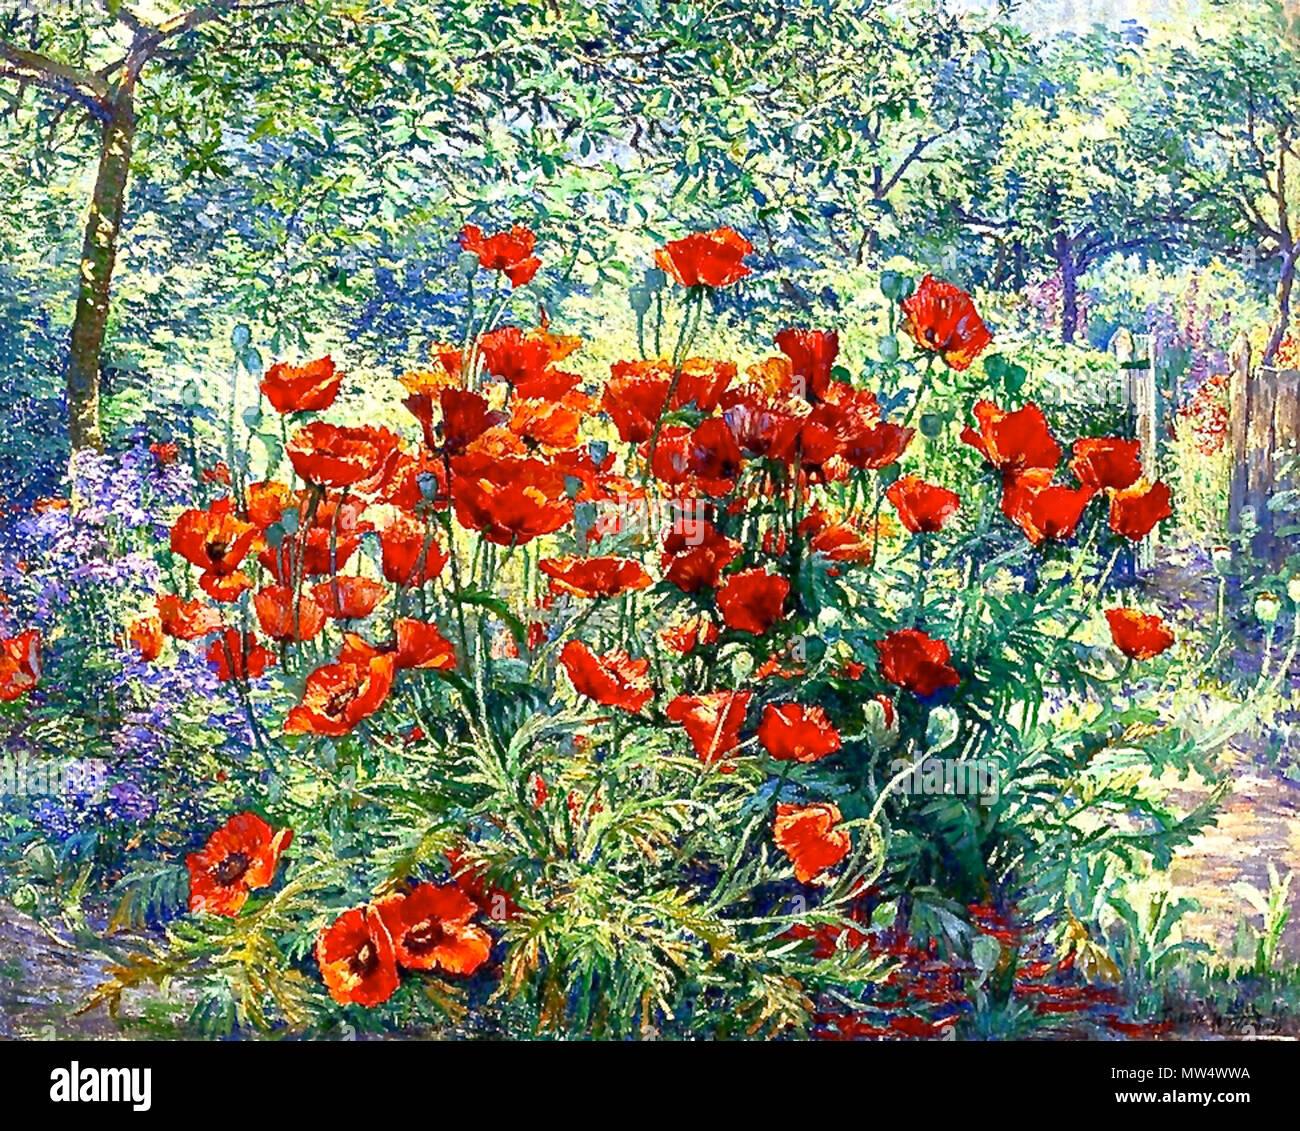 Deutsch: Juliette Wytsman: Le jardin fleuri (81.3 x 100.3 cm), Öl ...